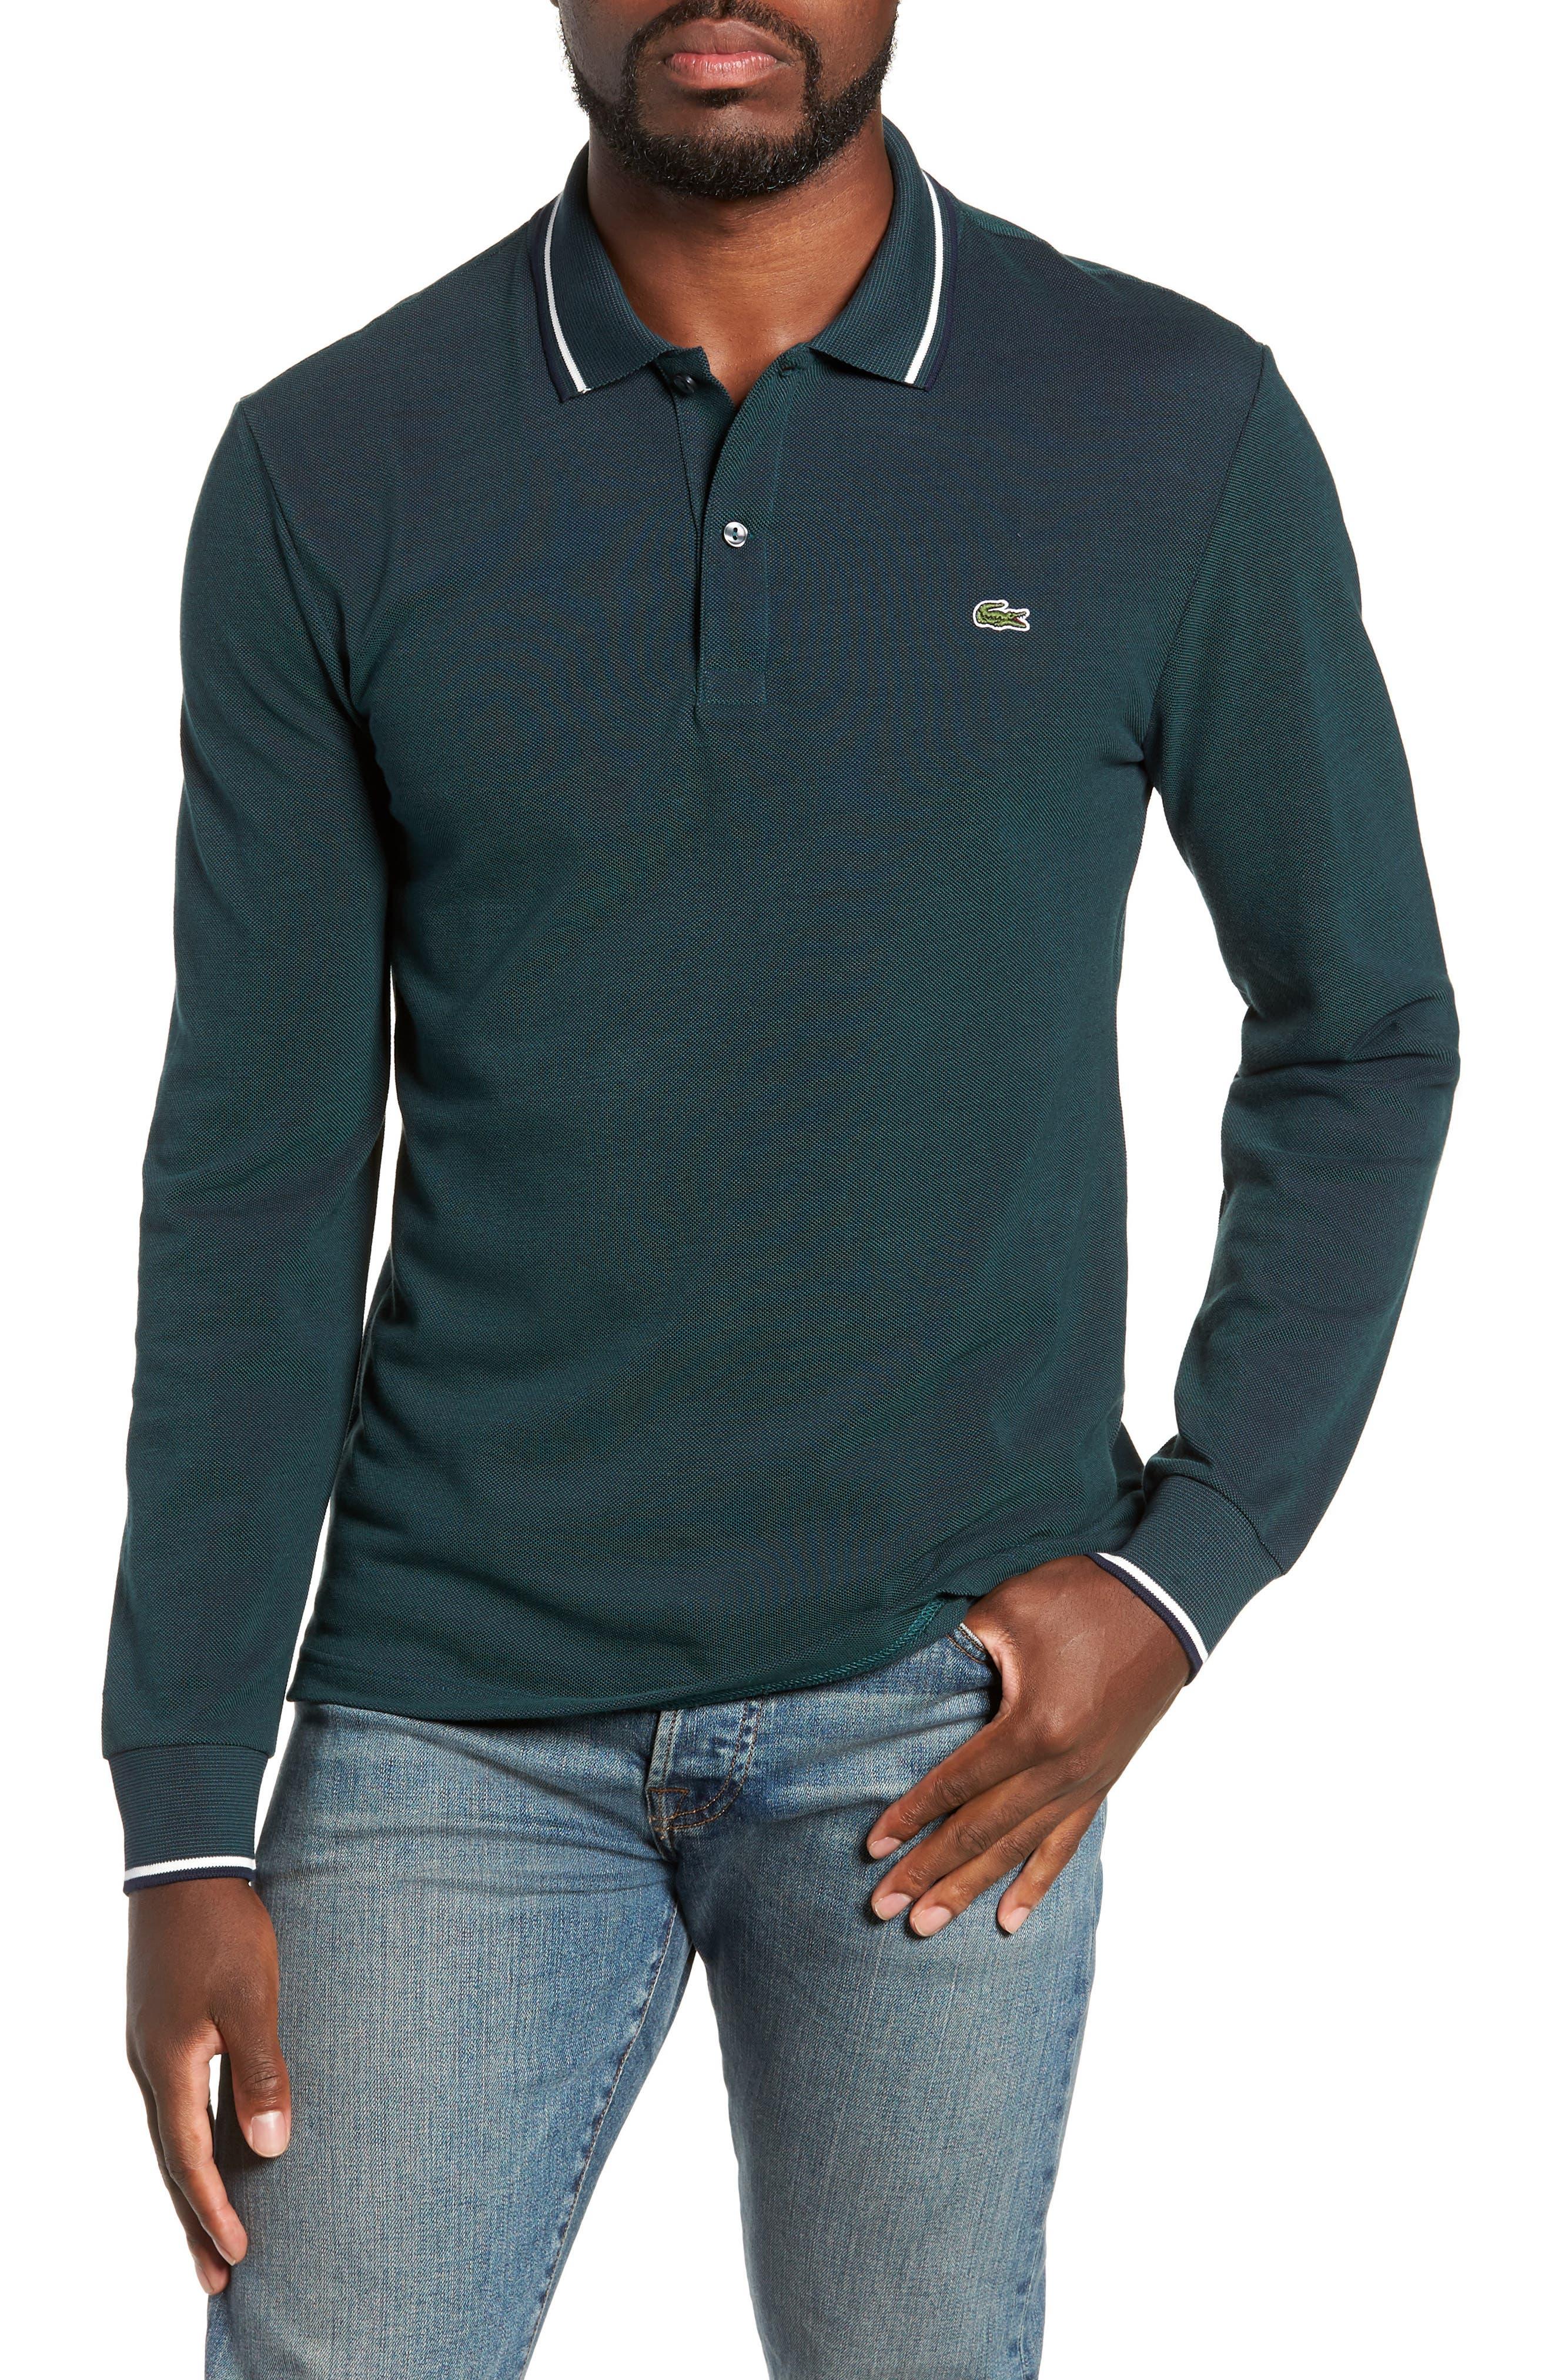 Slim Fit Long Sleeve Piqué Polo,                             Main thumbnail 1, color,                             ACONITE/ DARK NAVY BLUE